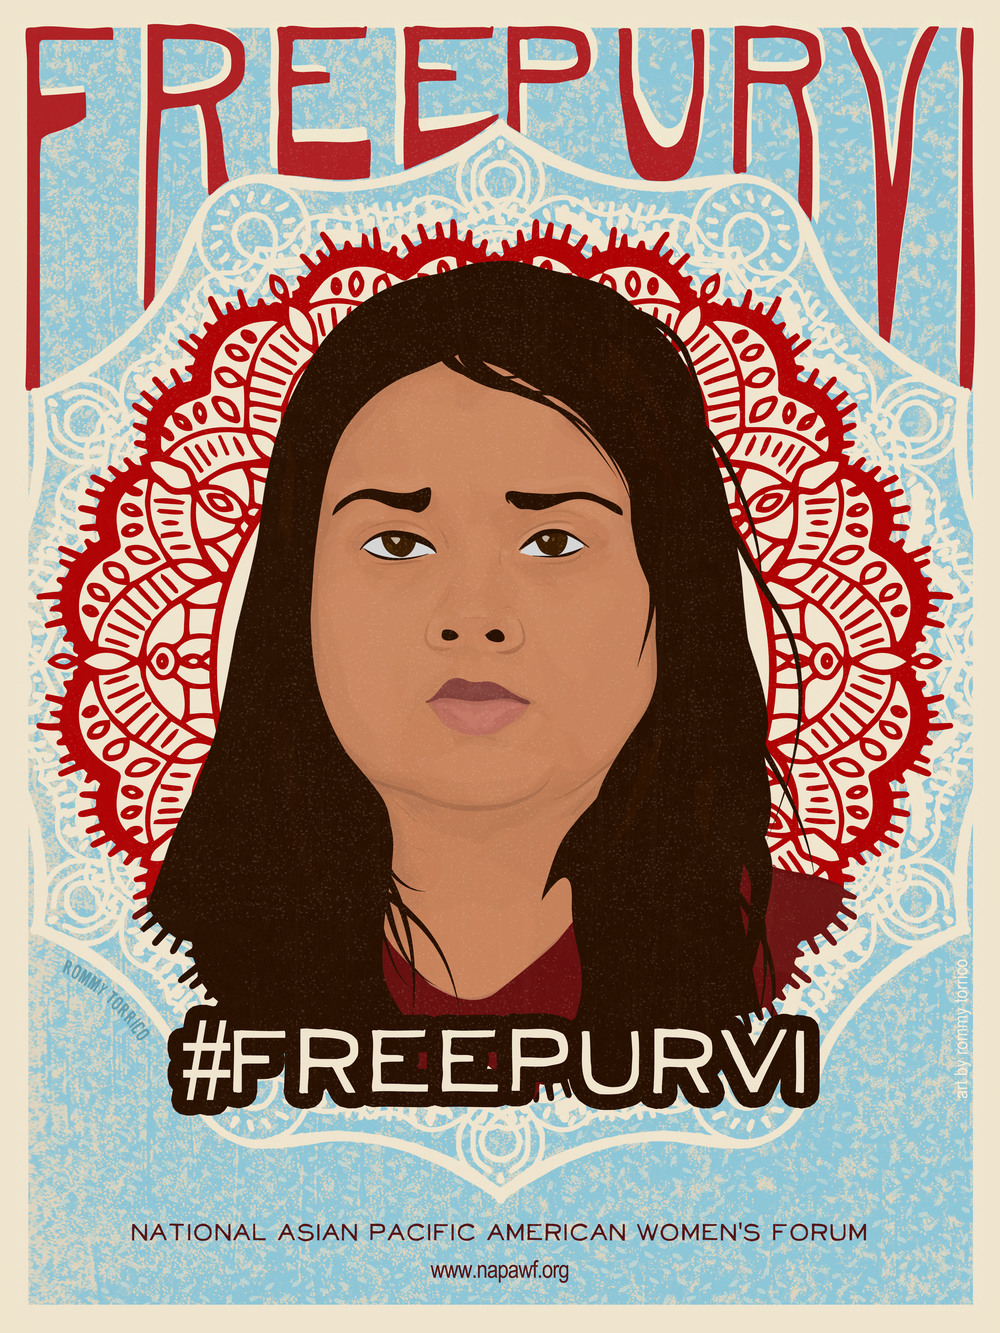 Free Purvi